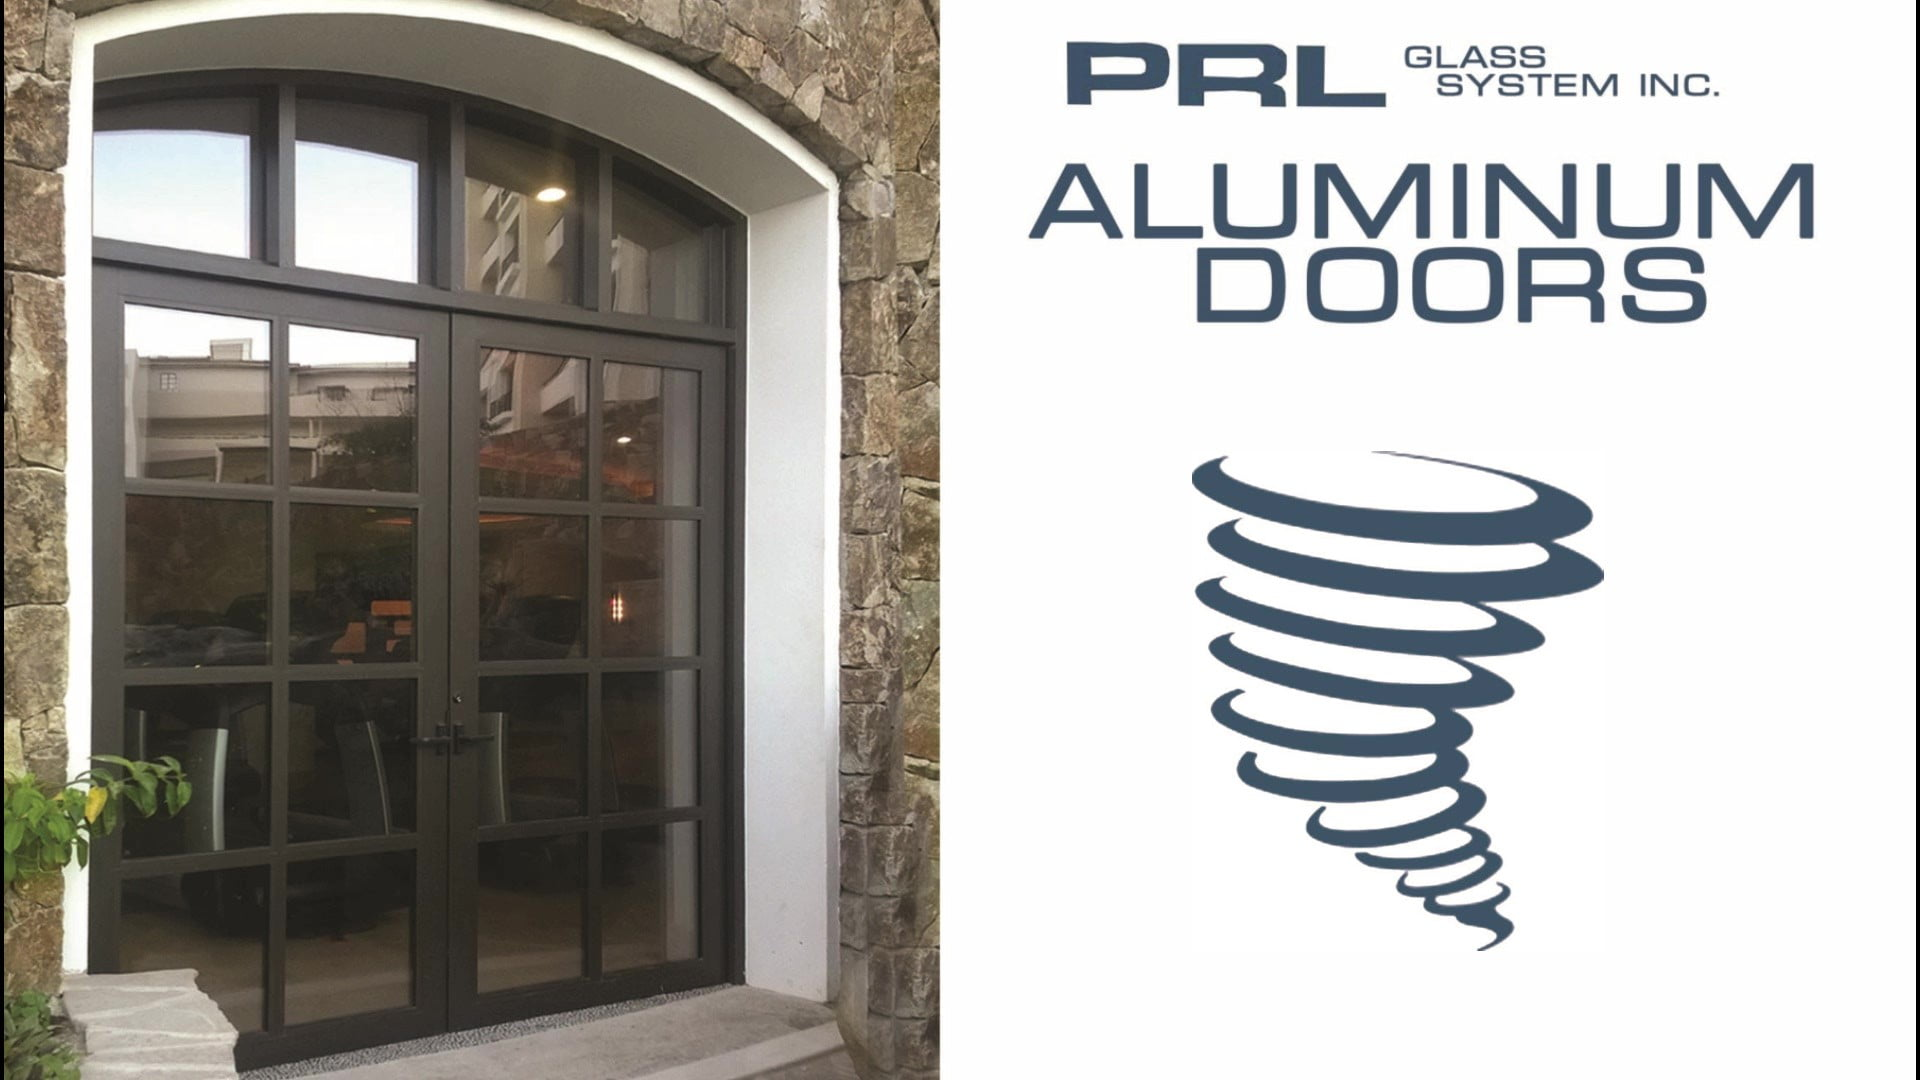 Aluminum Doors Video